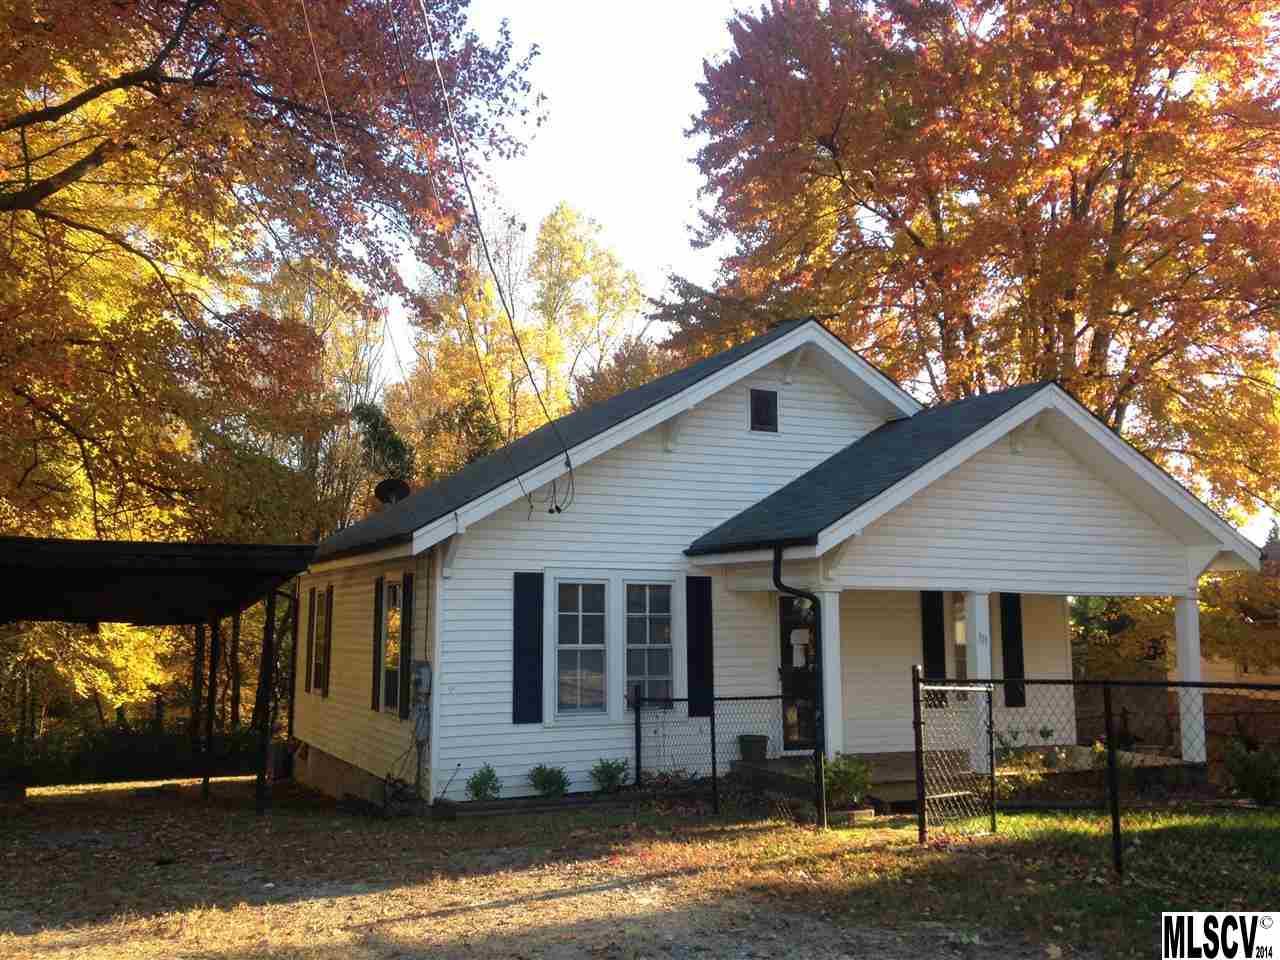 151 17th St Se, Hickory, NC 28602